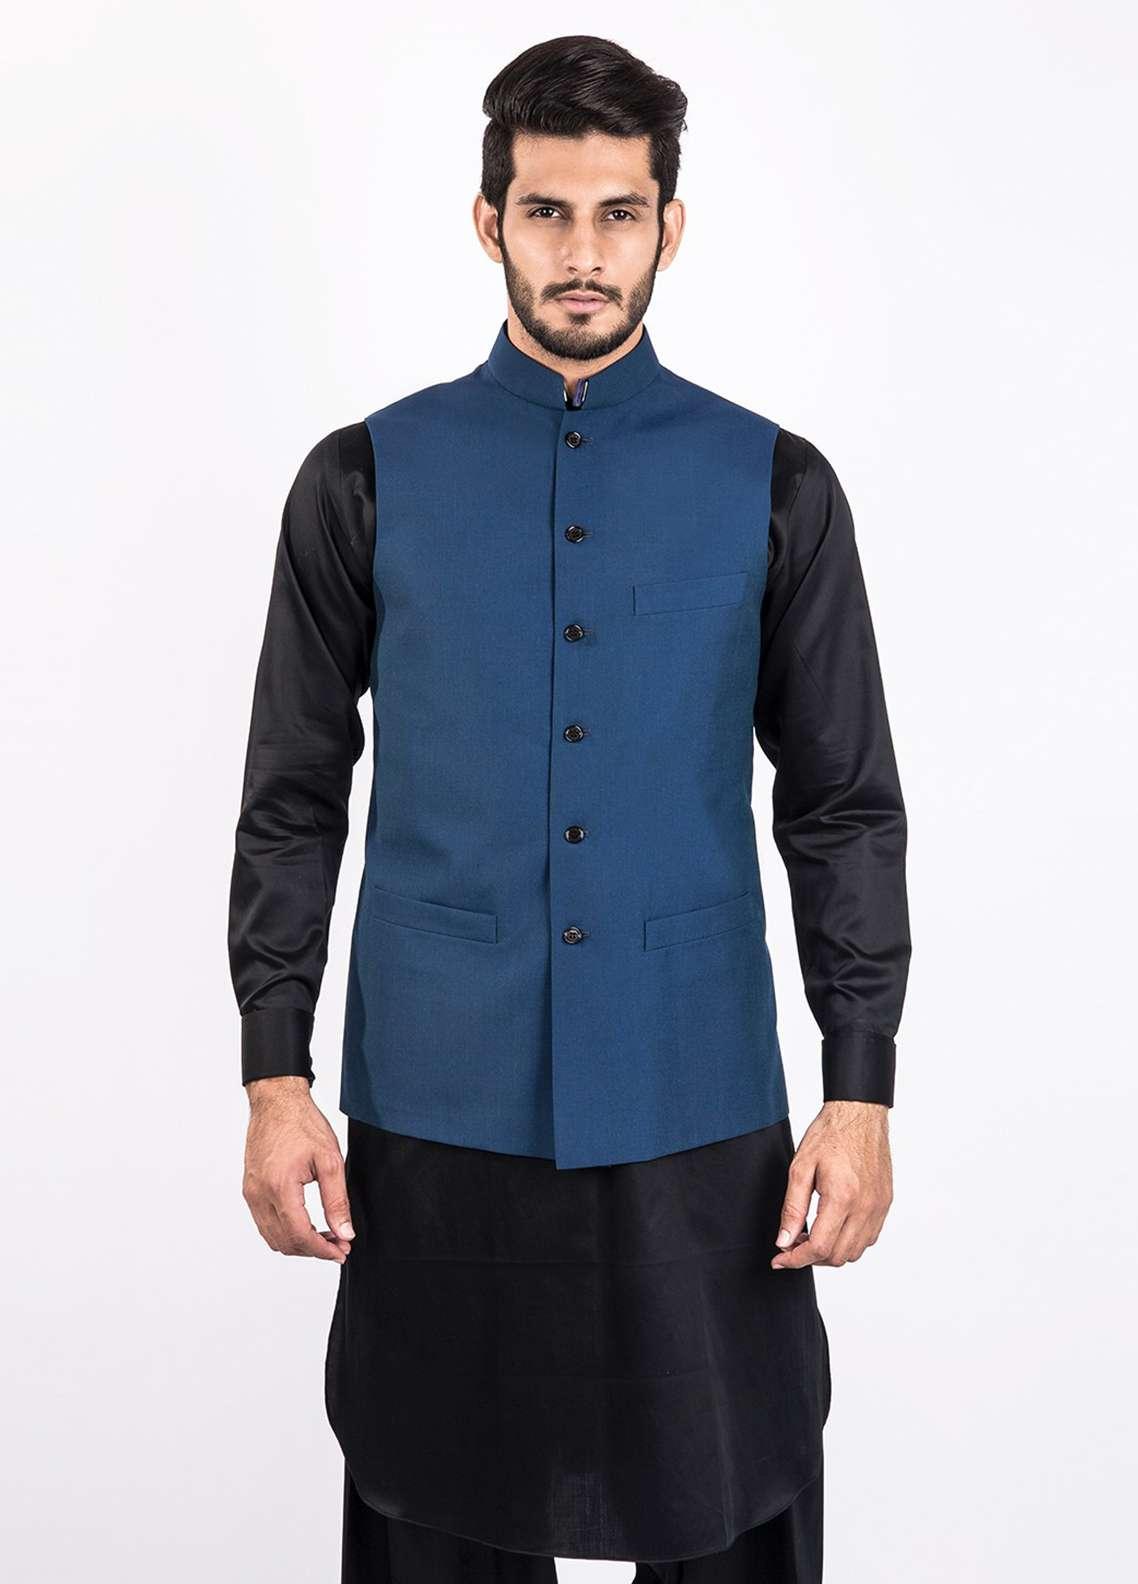 Lawrencepur Wool Blend Plain Texture Men Waistcoats - Blue LW18W 07